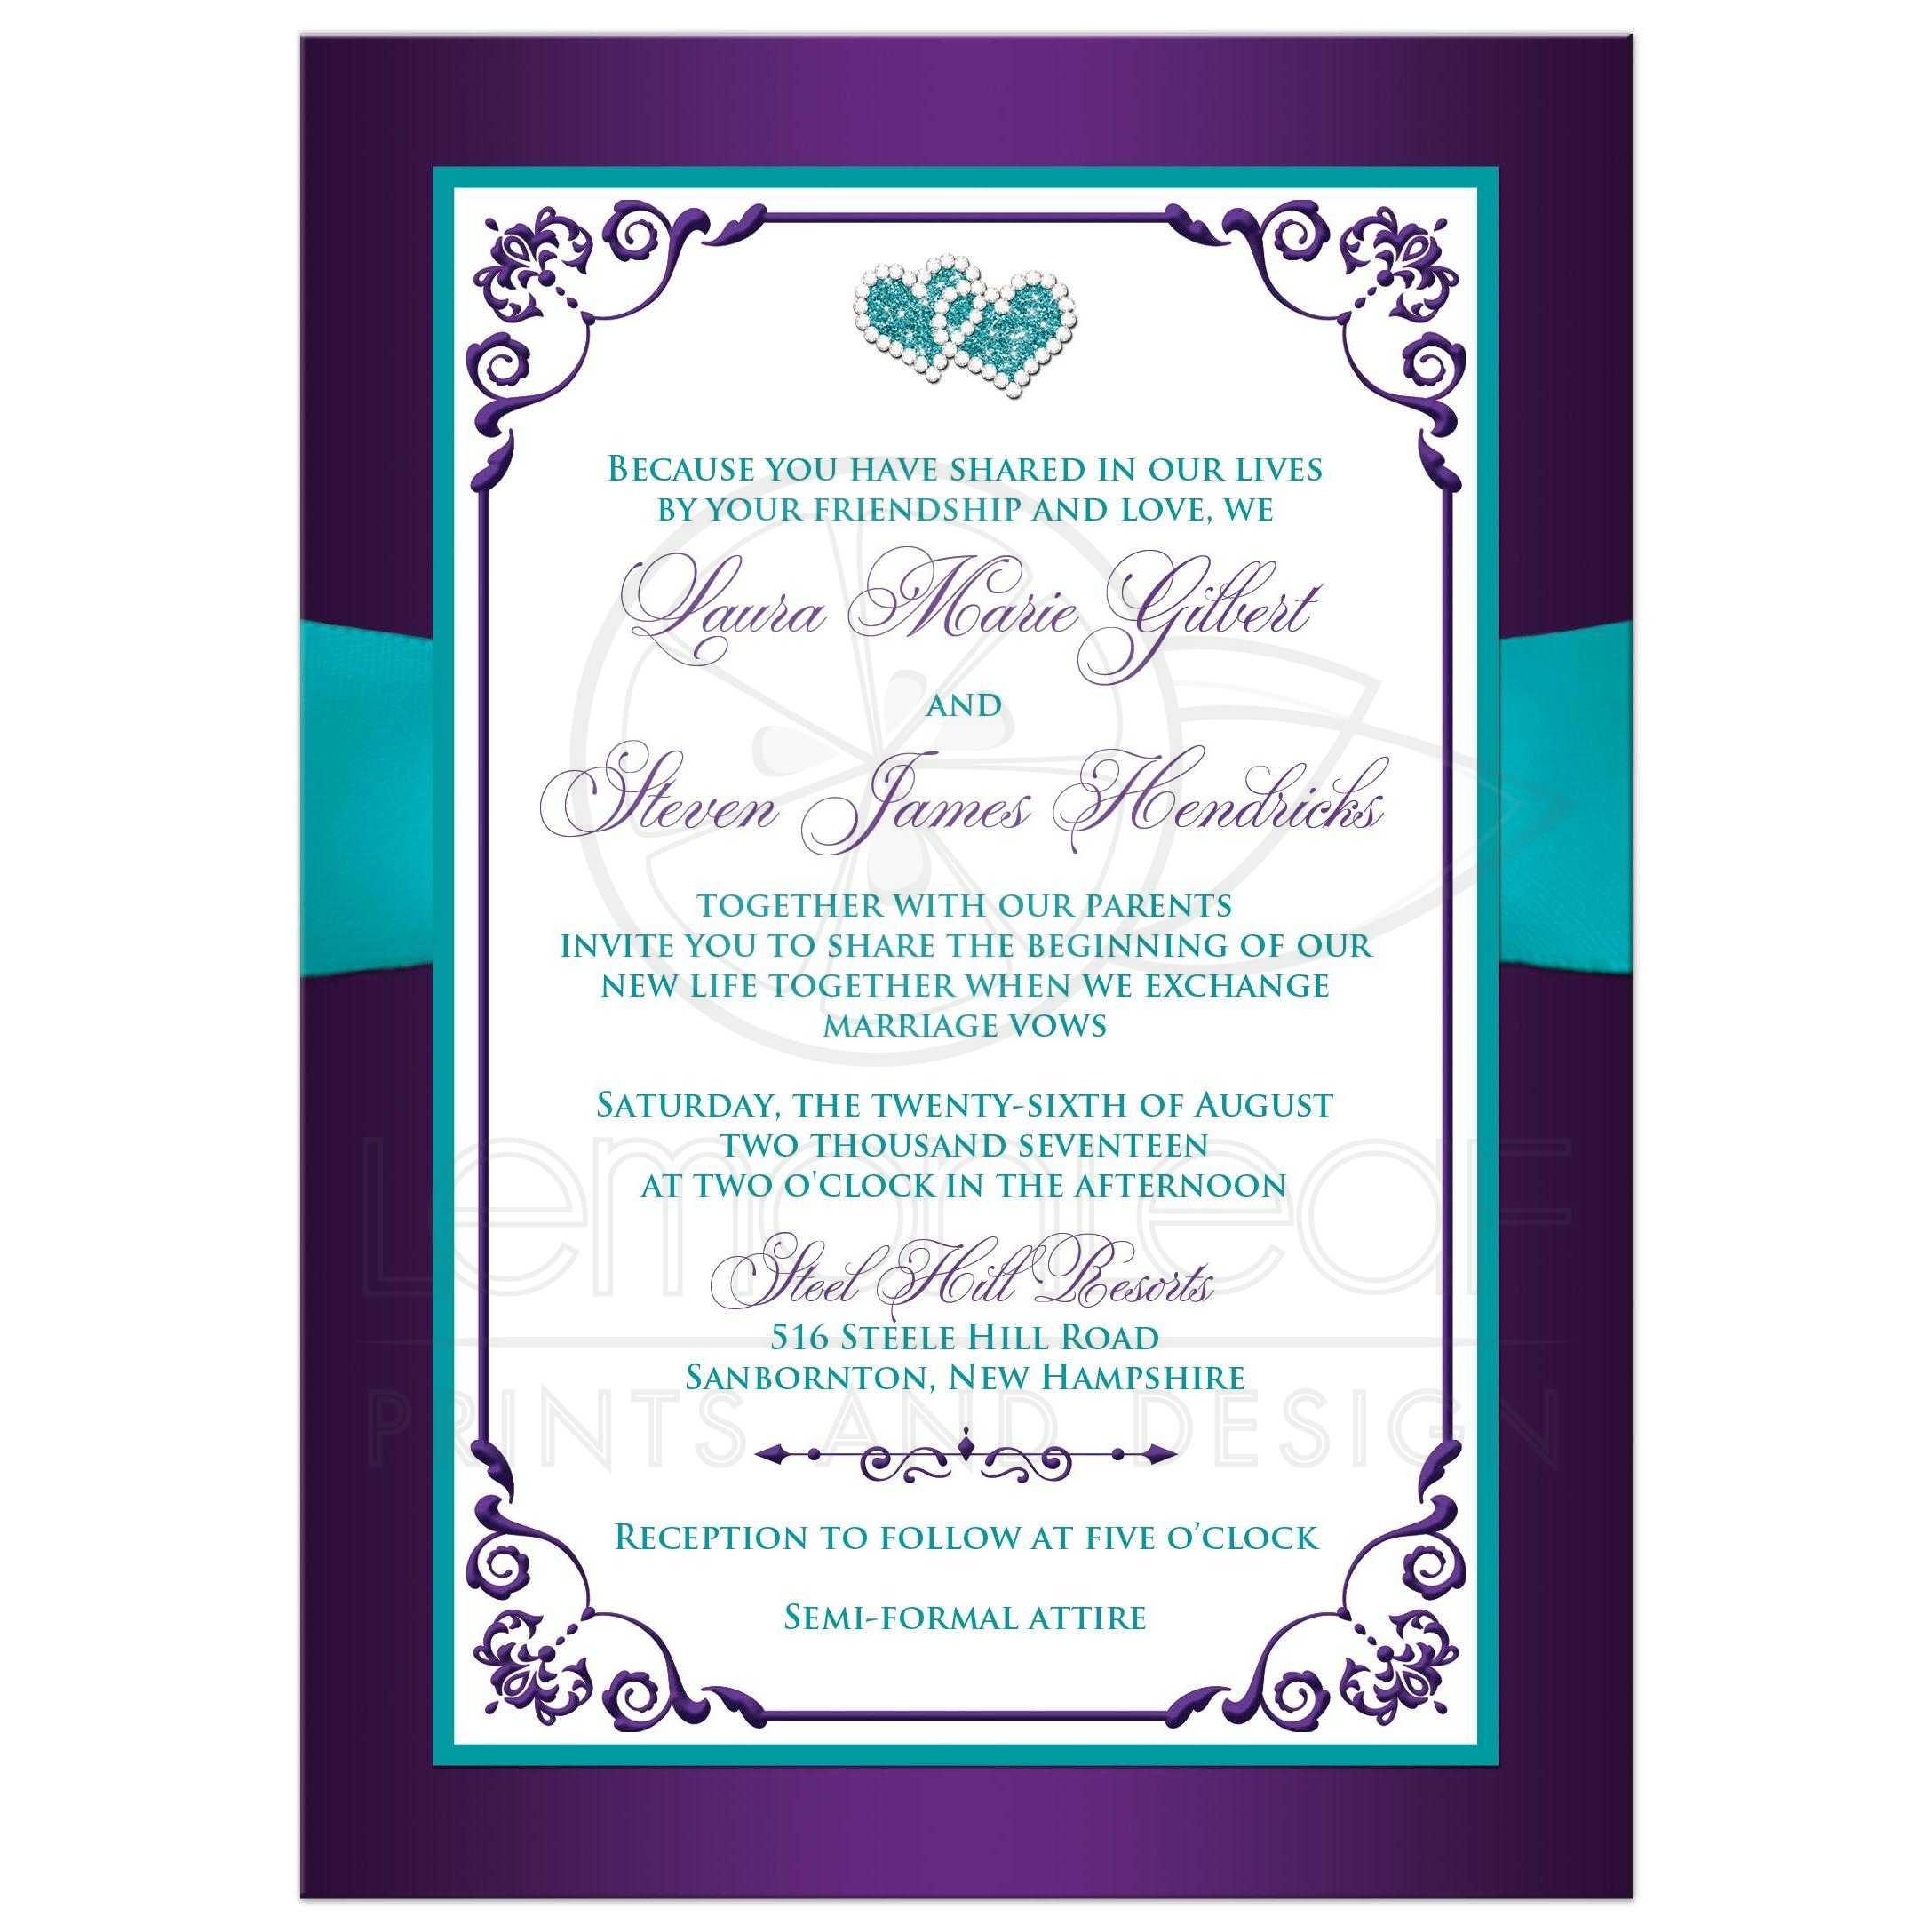 Bat Mitzvah Invitation with nice invitations ideas